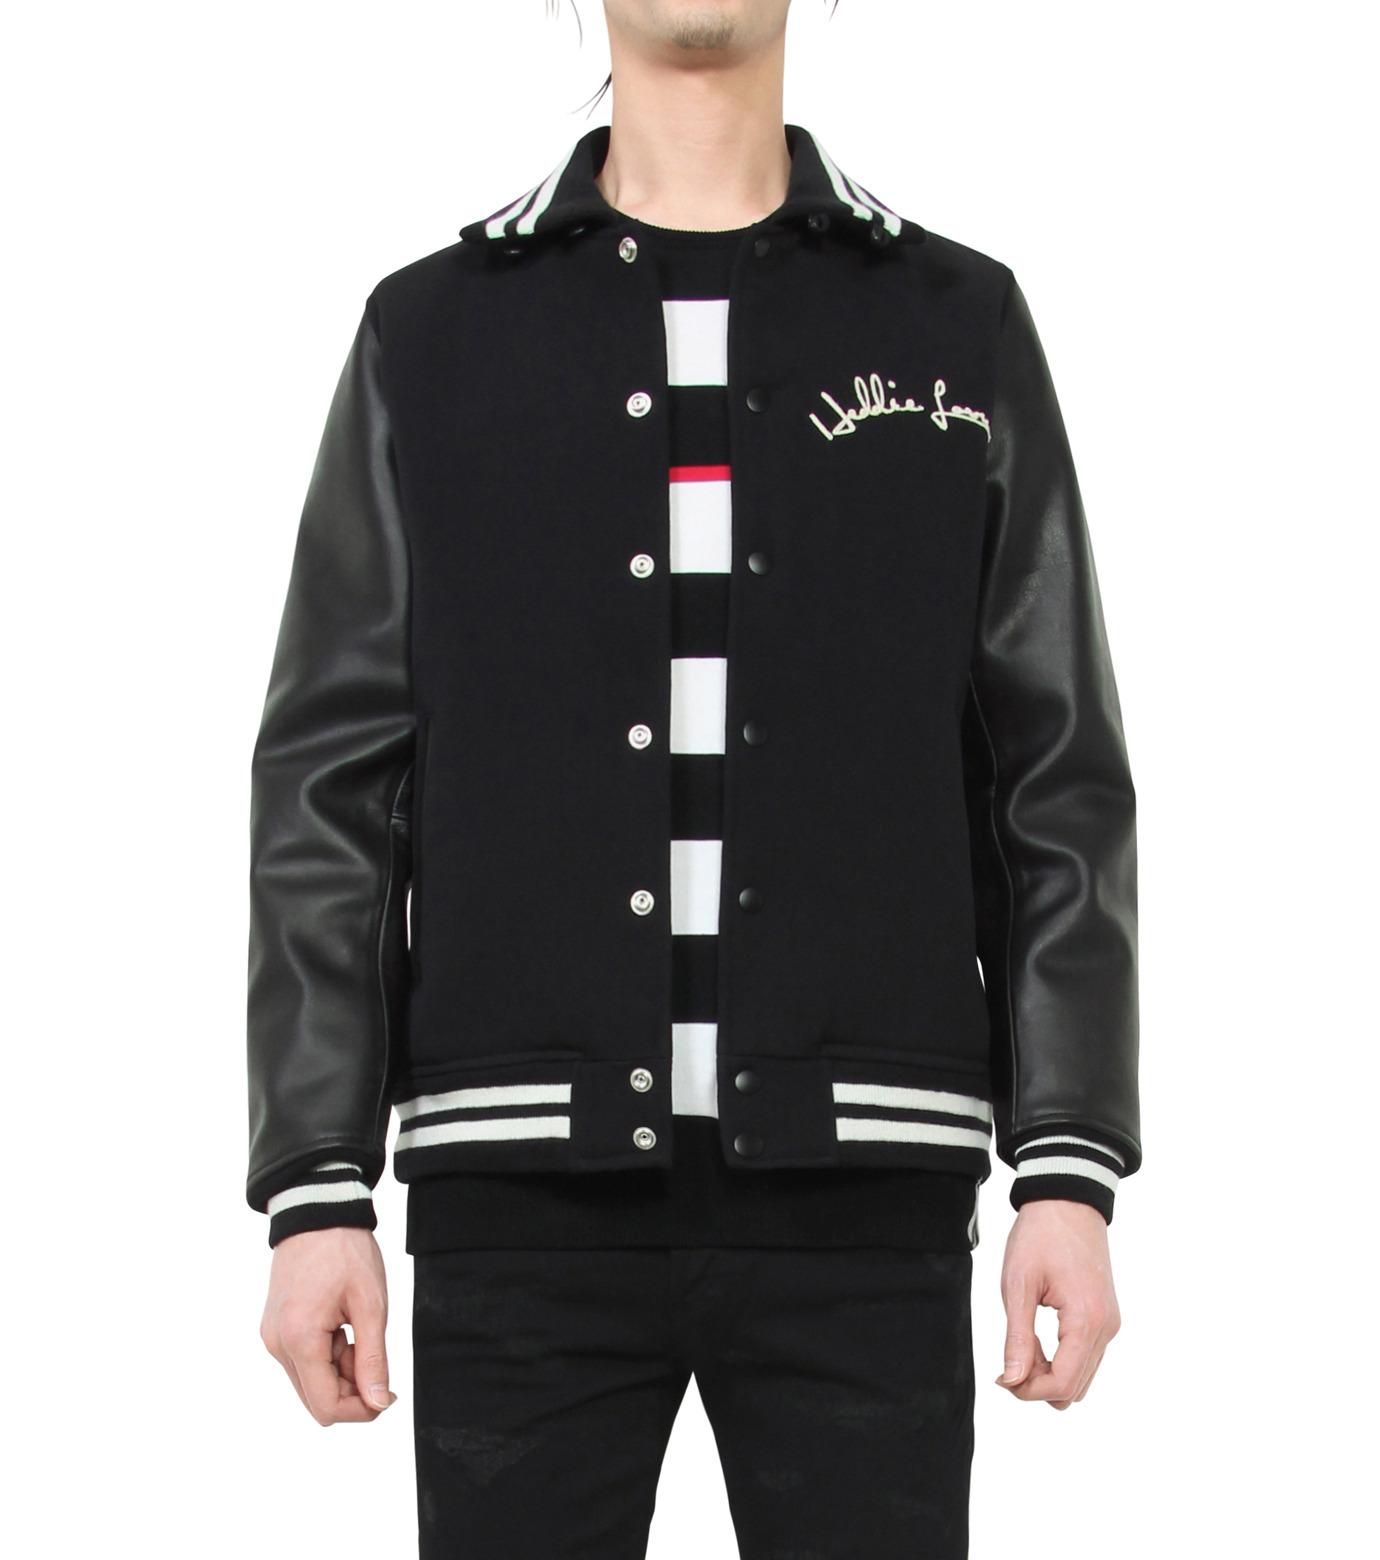 HL HEDDIE LOVU(エイチエル・エディールーヴ)のSTADIUM JACKET-BLACK(ジャケット/jacket)-18S94002-13 拡大詳細画像1